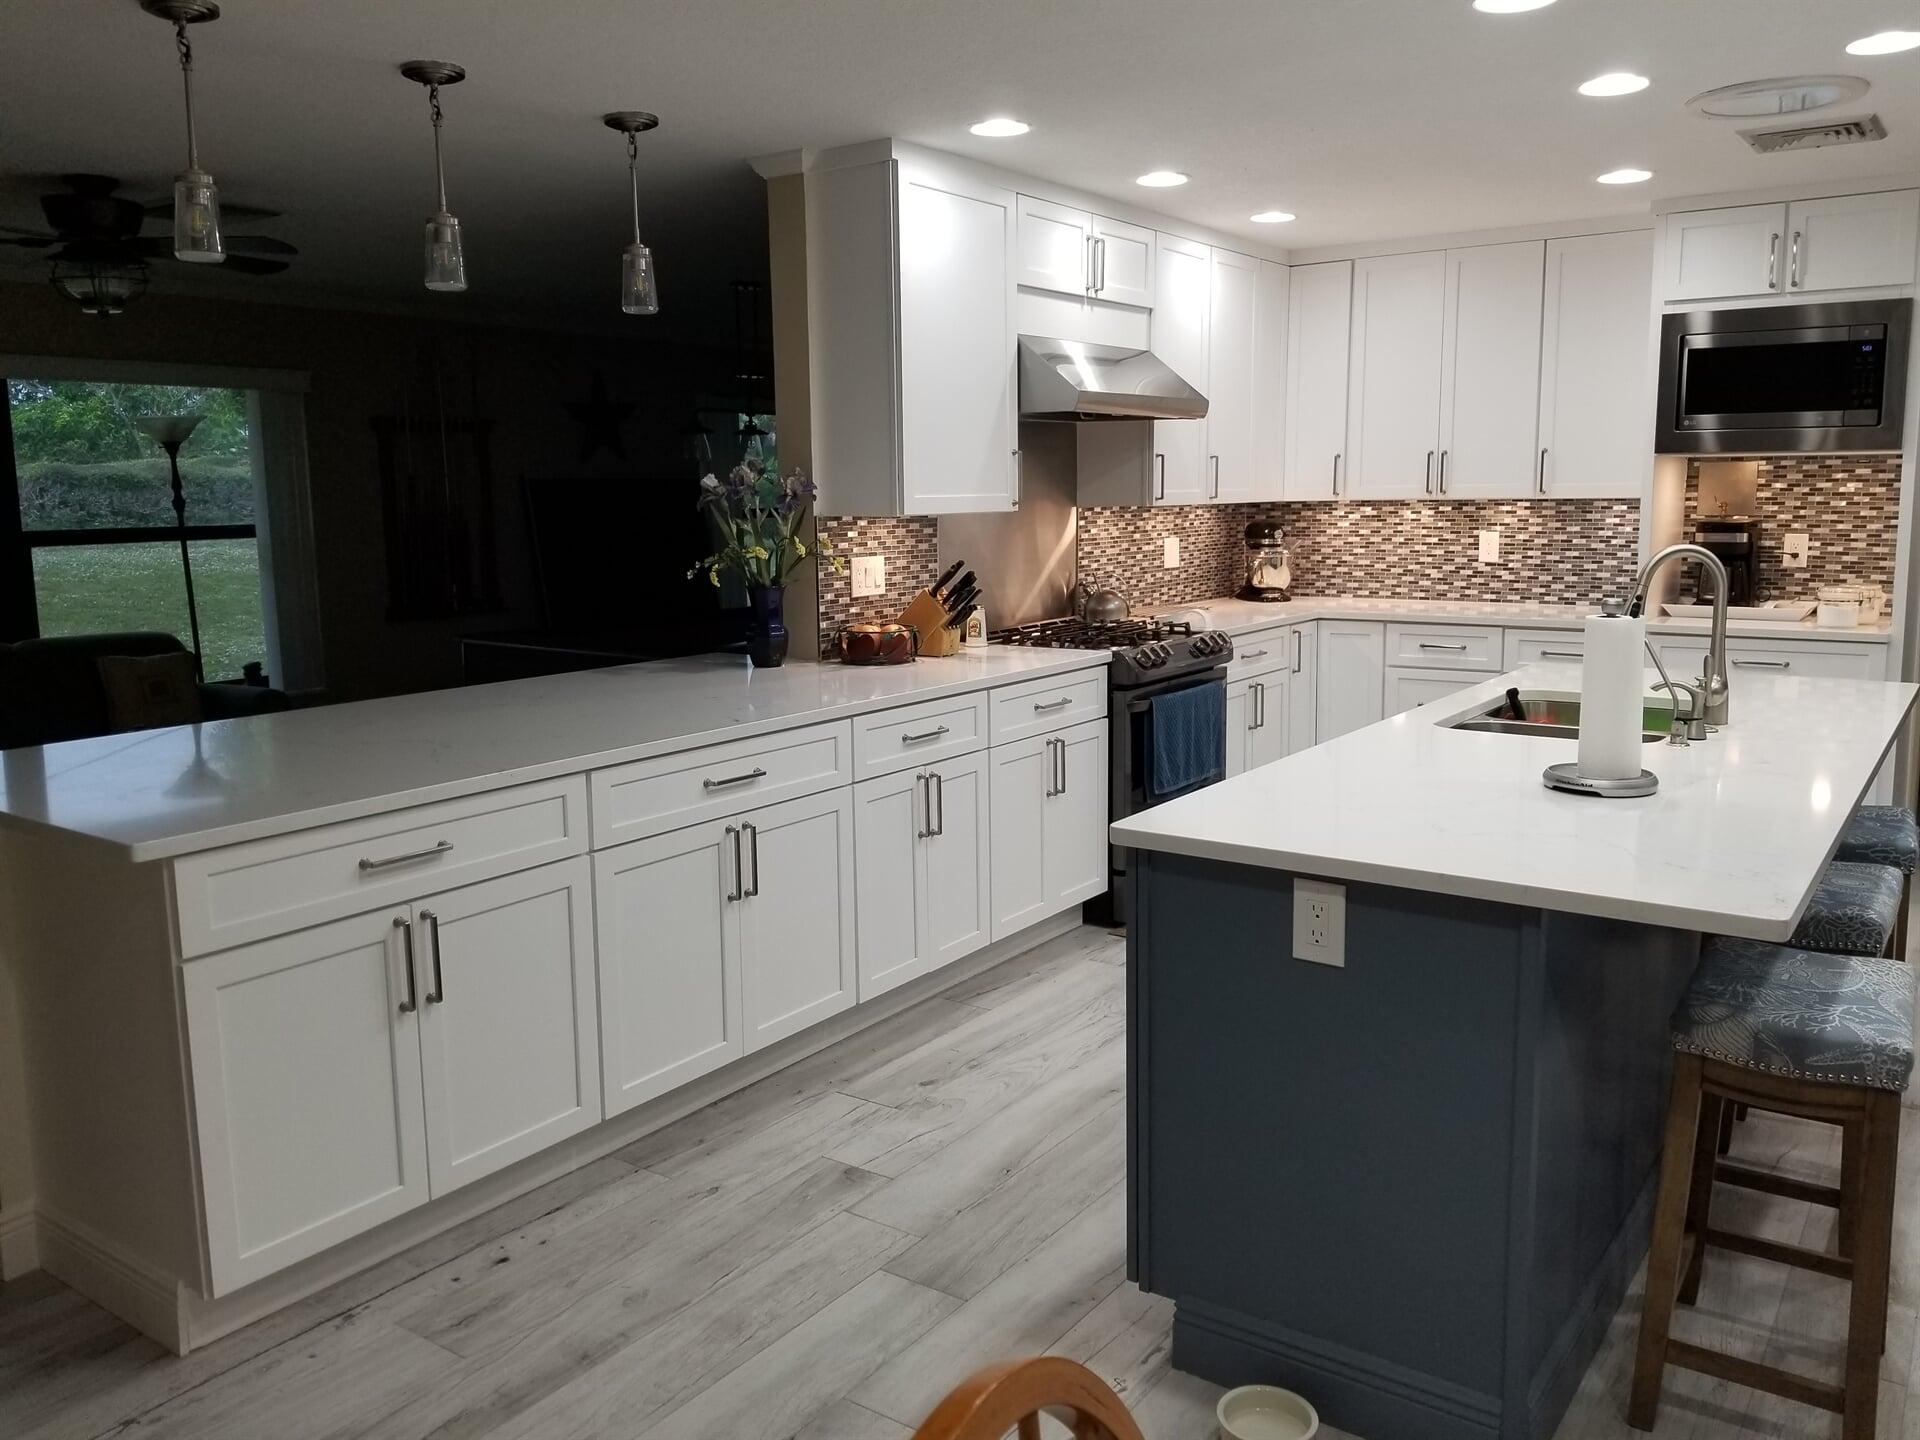 Beautiful kitchen remodel in Stuart, FL from Agler Kitchen, Bath & Floors